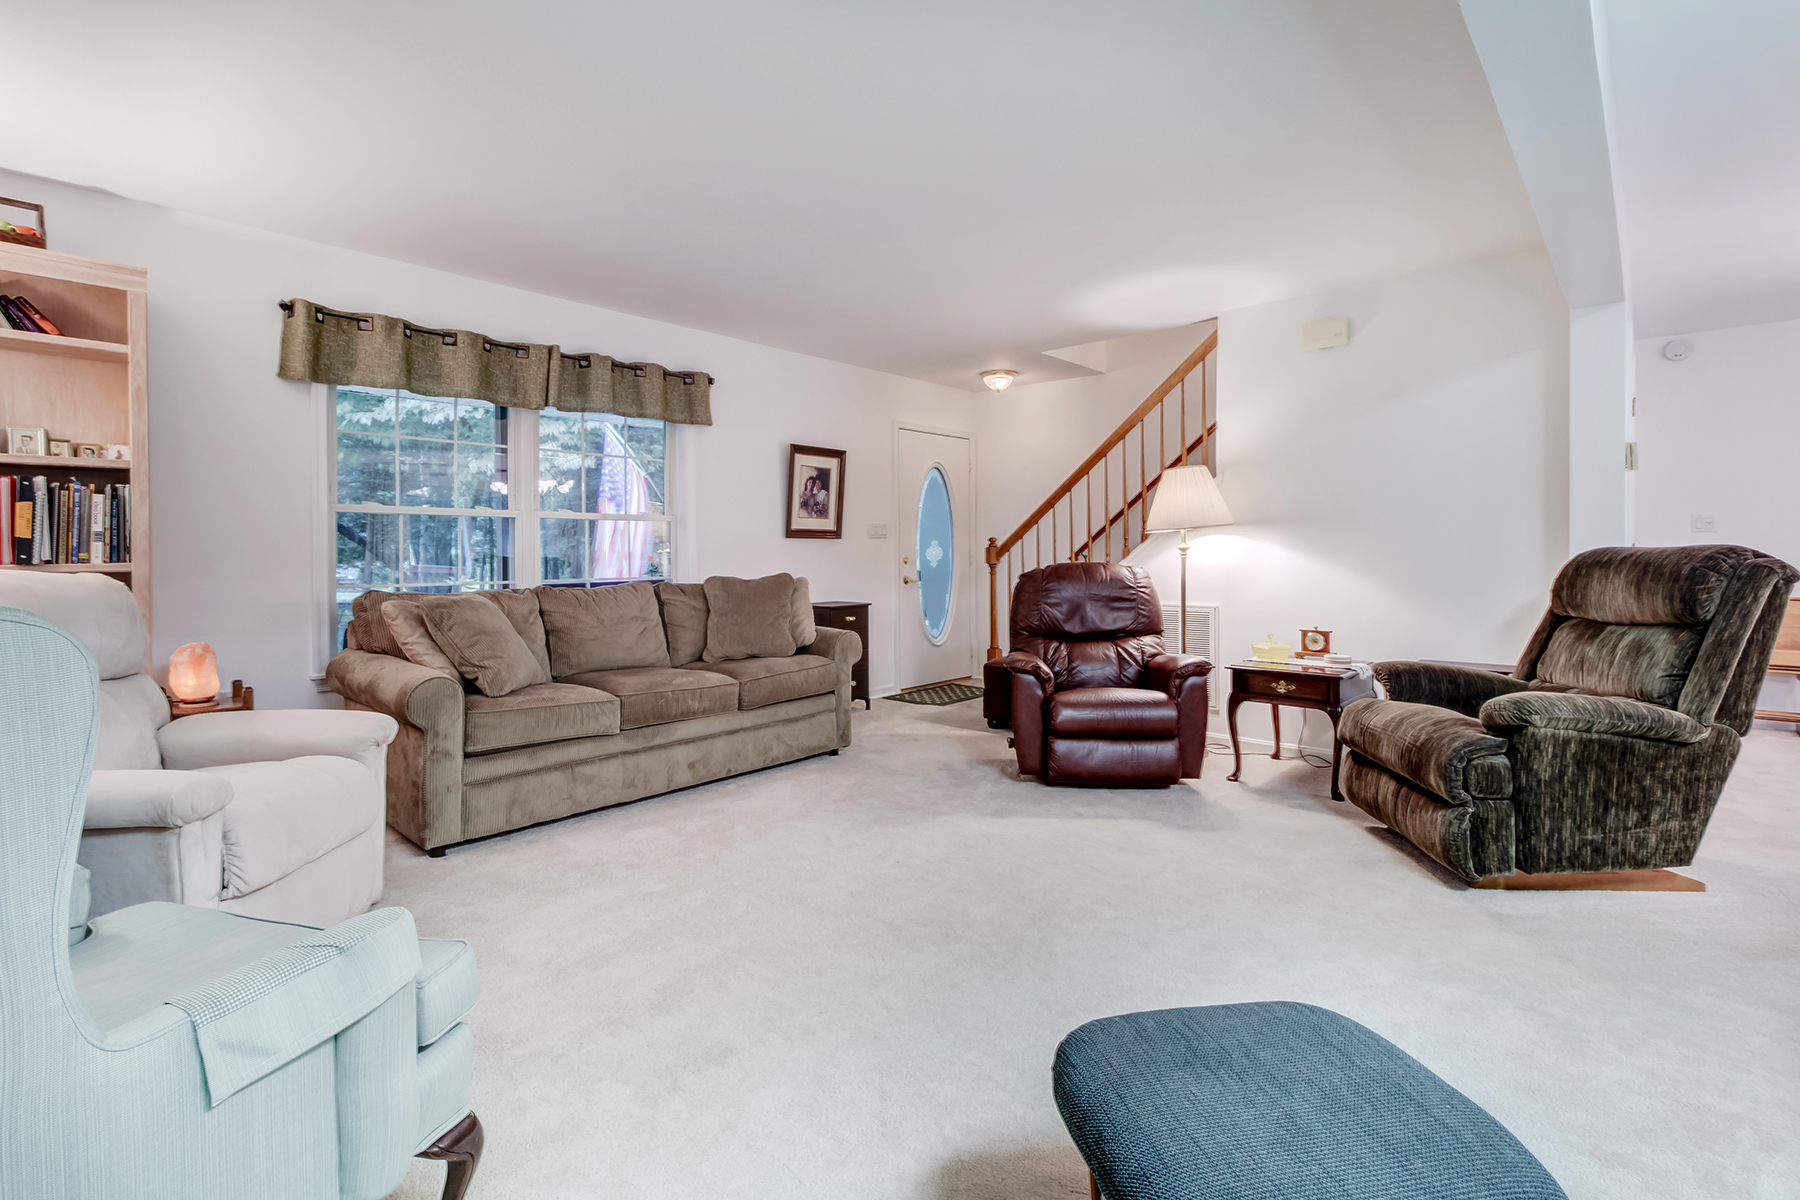 Additional photo for property listing at 32828 Pine Cone Ln , Frankford, DE 19945 32828  Pinecone Ln, Frankford, Delaware 19945 Estados Unidos